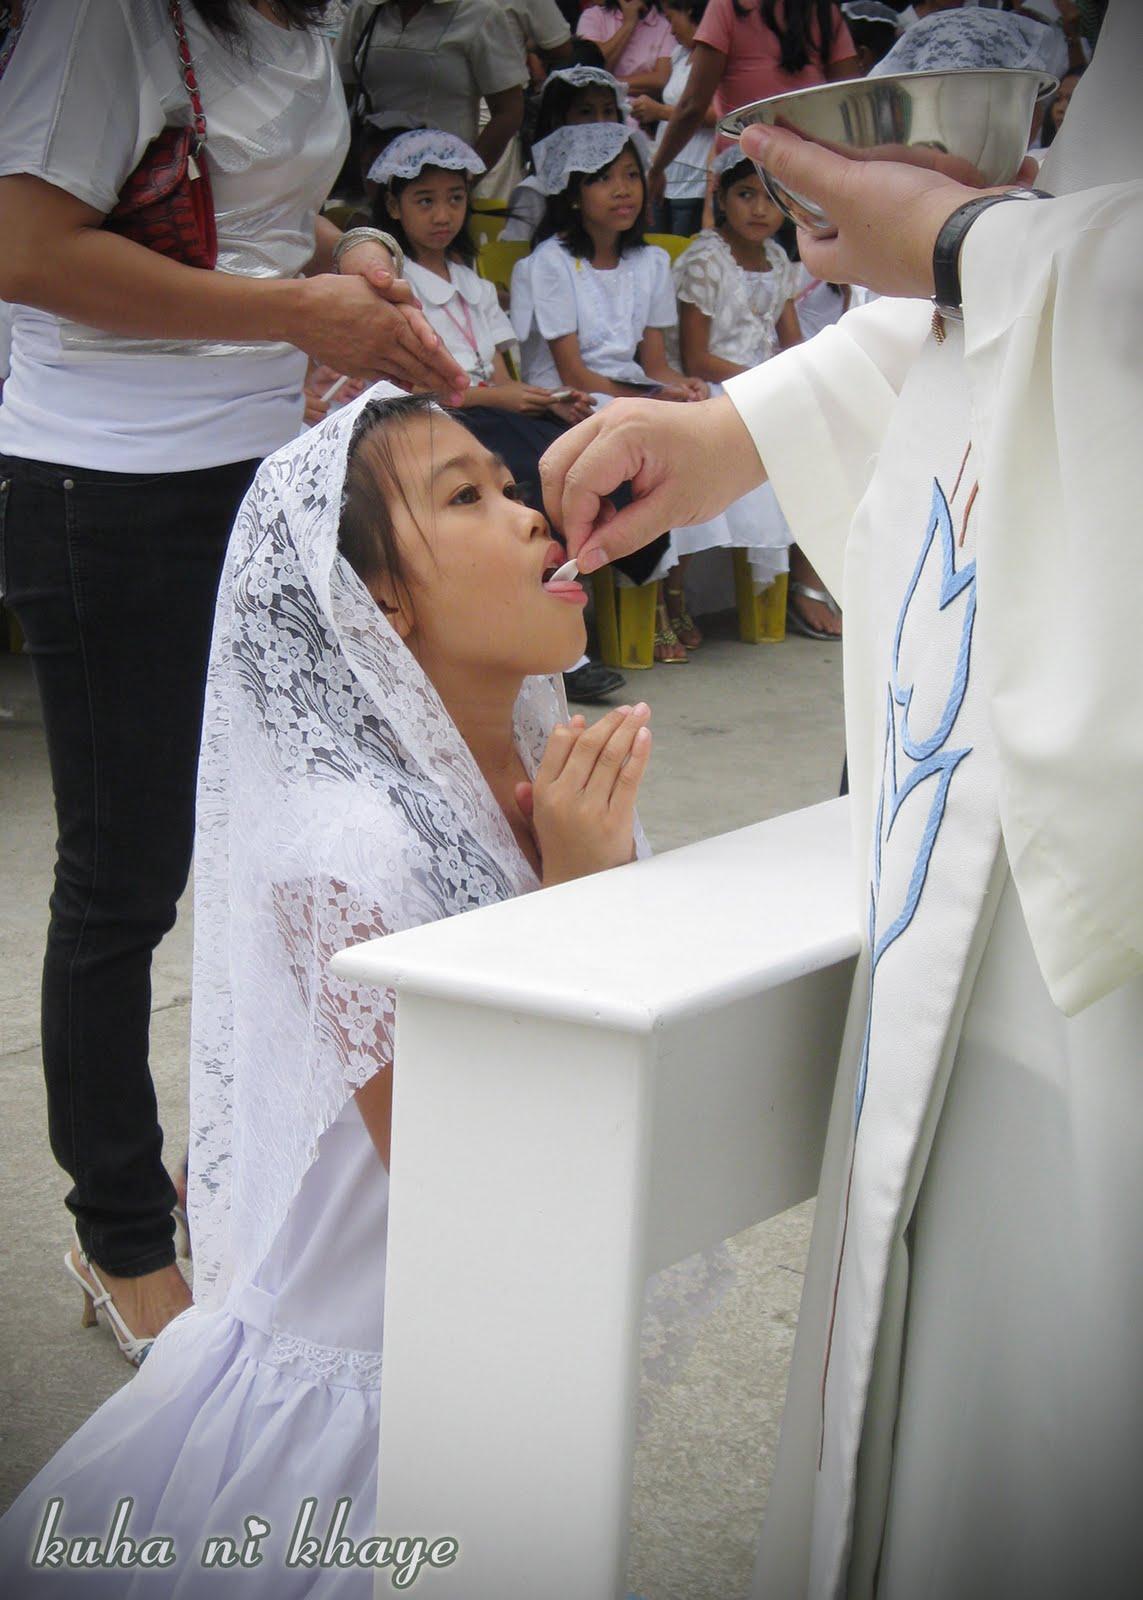 Litratista: First Communion